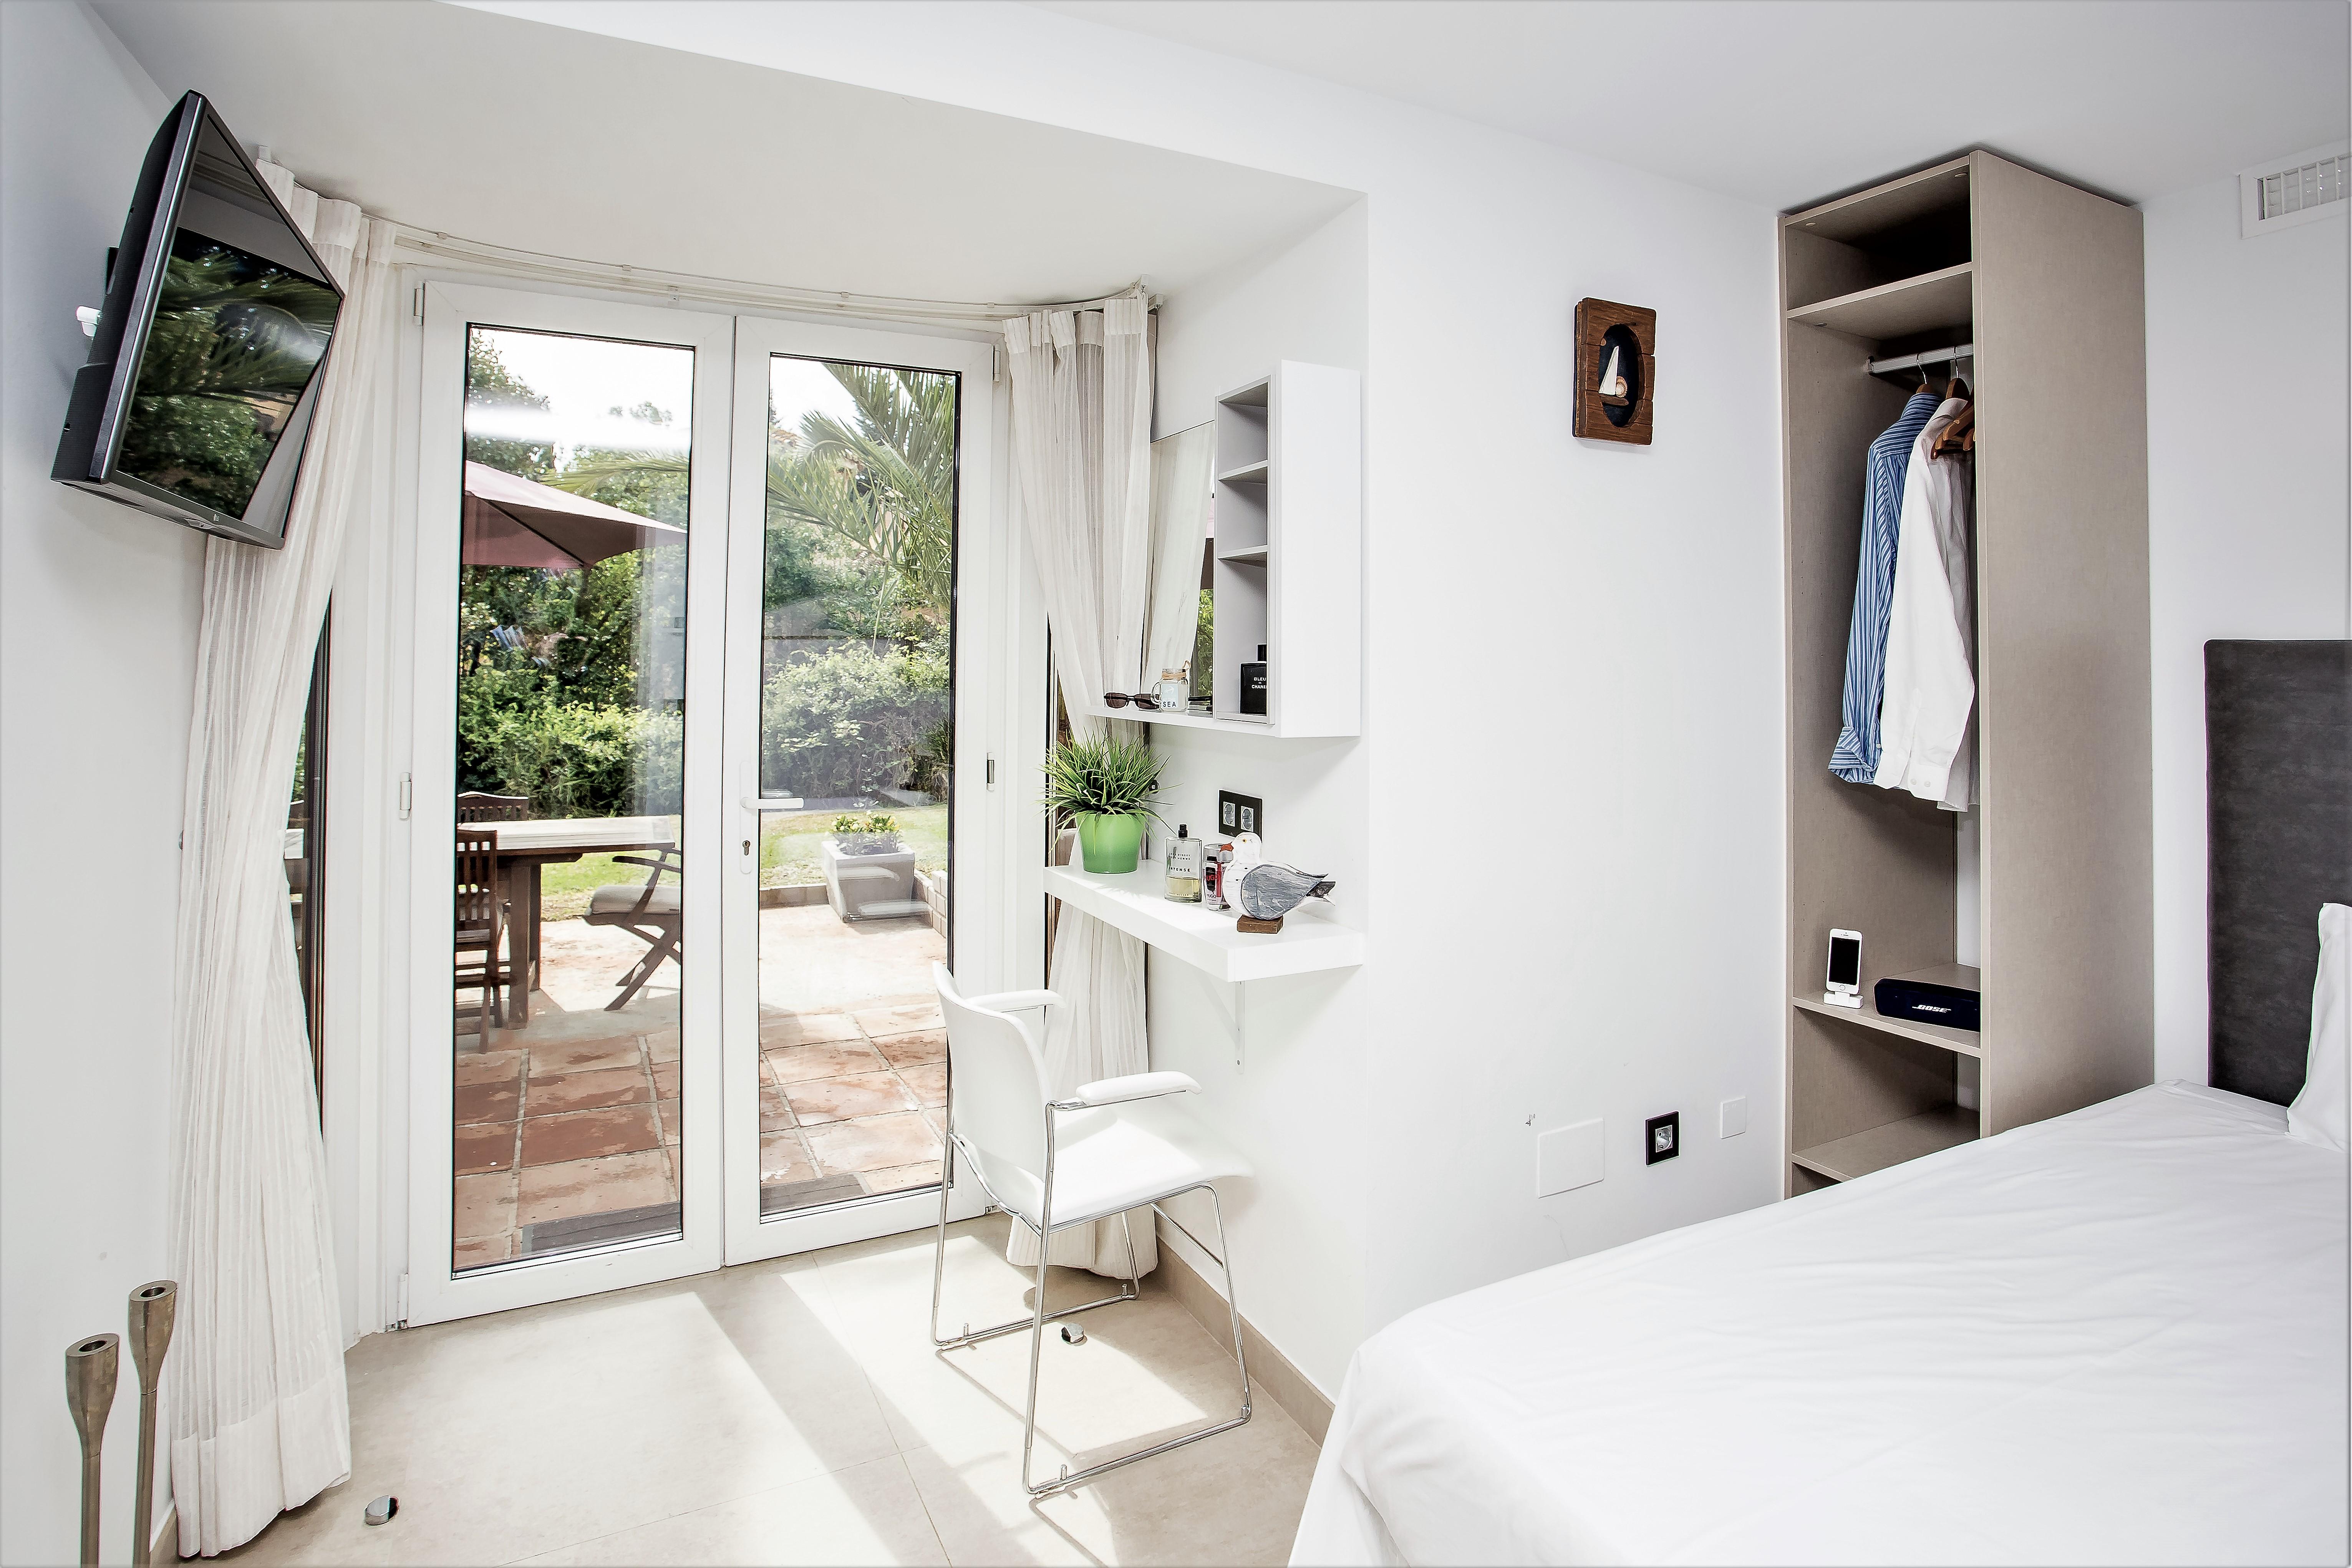 Apartment 4 B R  VILLA by Puerto Banus   Sea 5 m                                photo 20341550